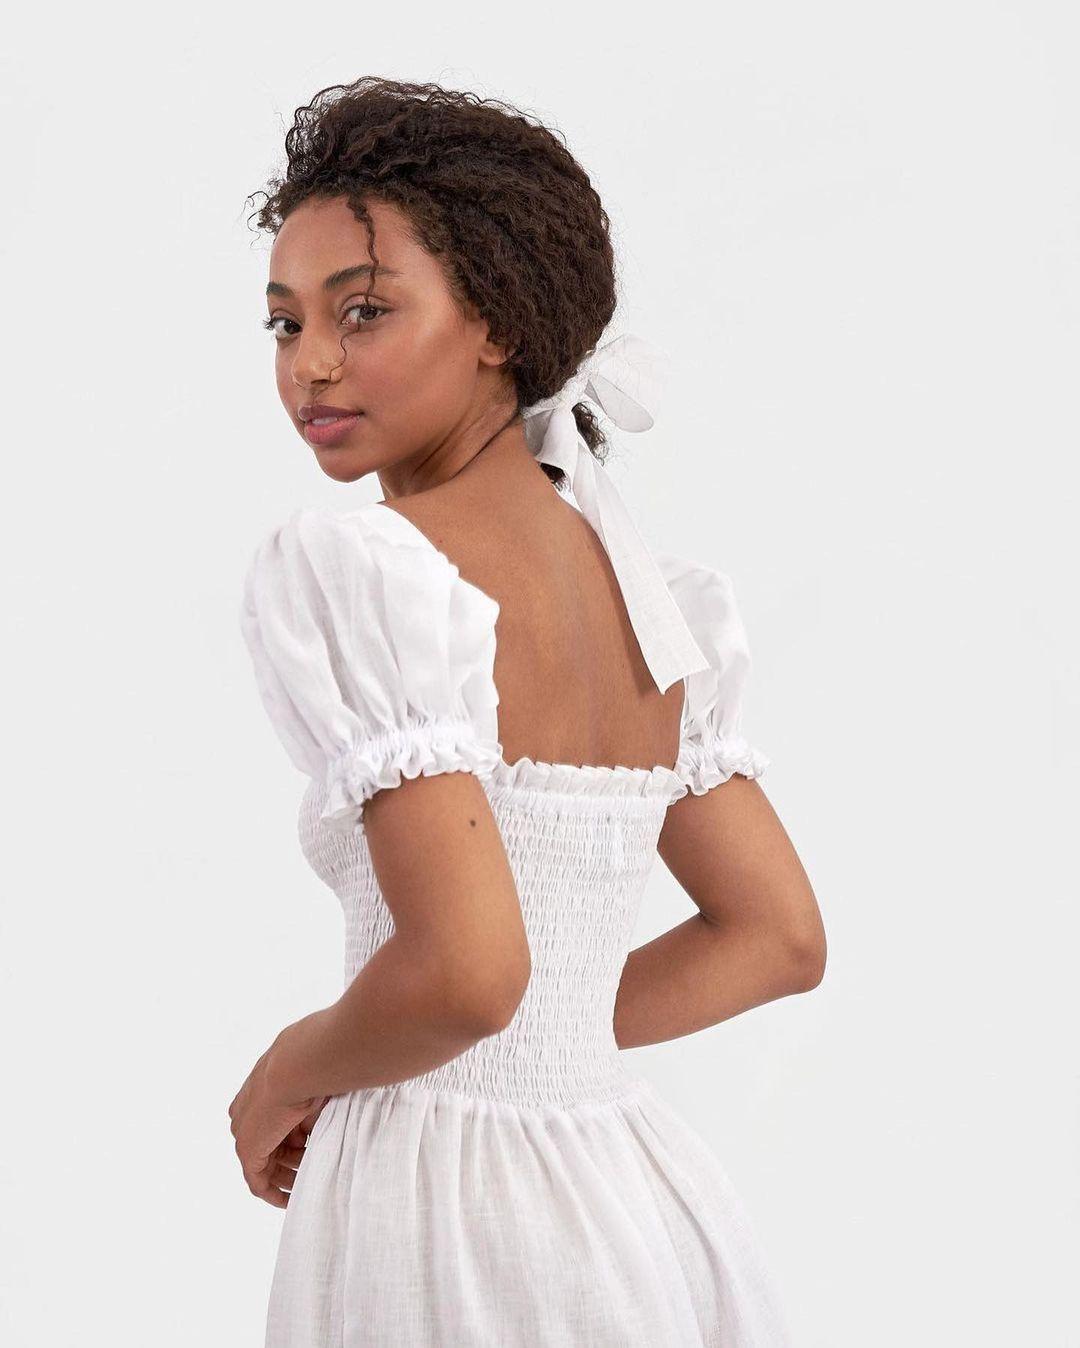 Belle Linen Dress In White Sleeper In 2021 Flower Girl Dresses Linen Dress White Dress [ 1348 x 1080 Pixel ]